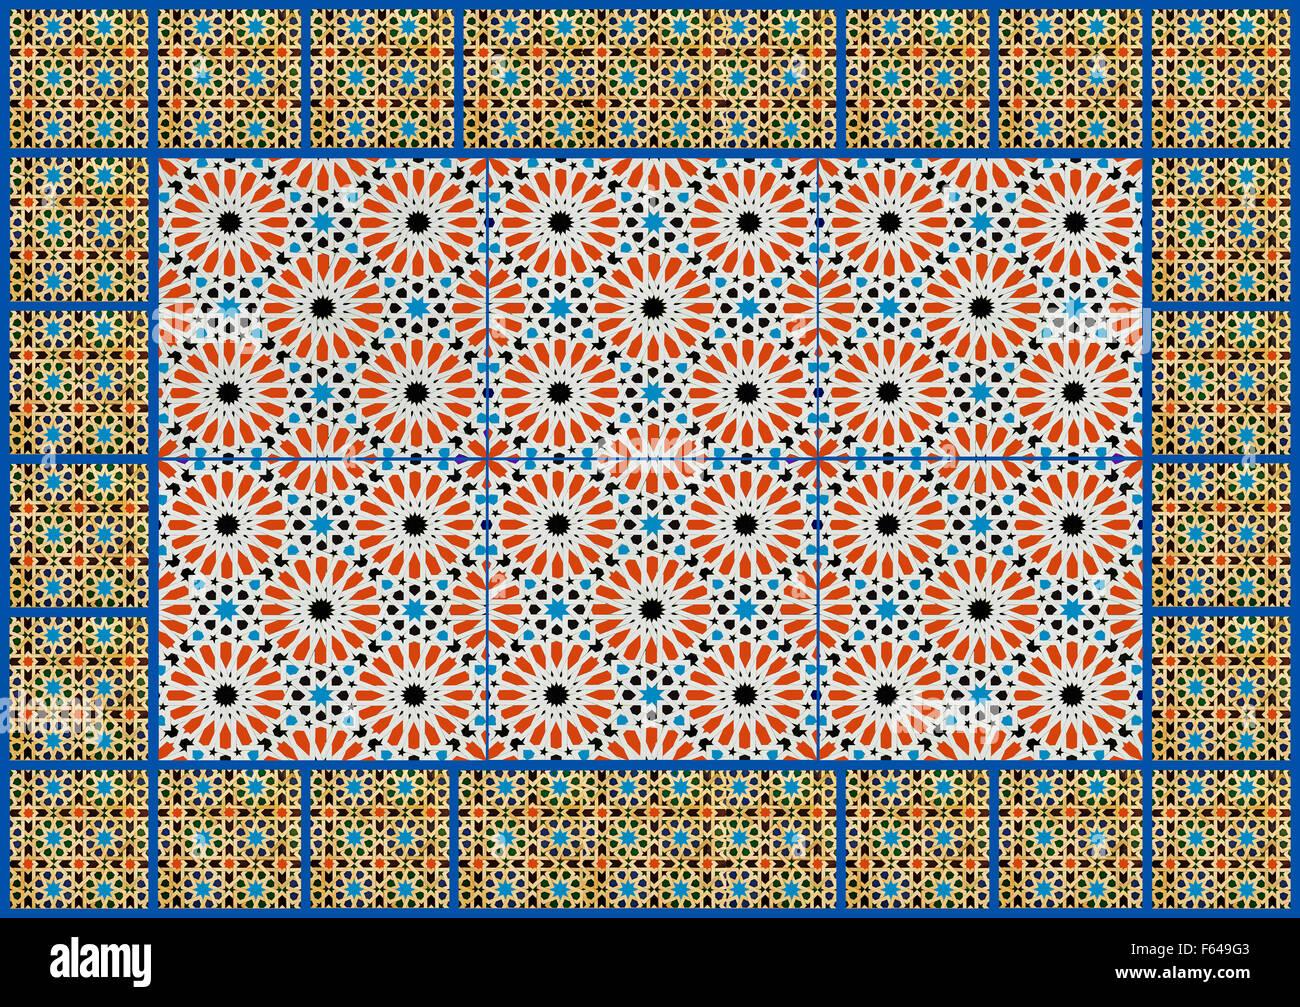 Collage Moorish geometric design wall tiles - Stock Image